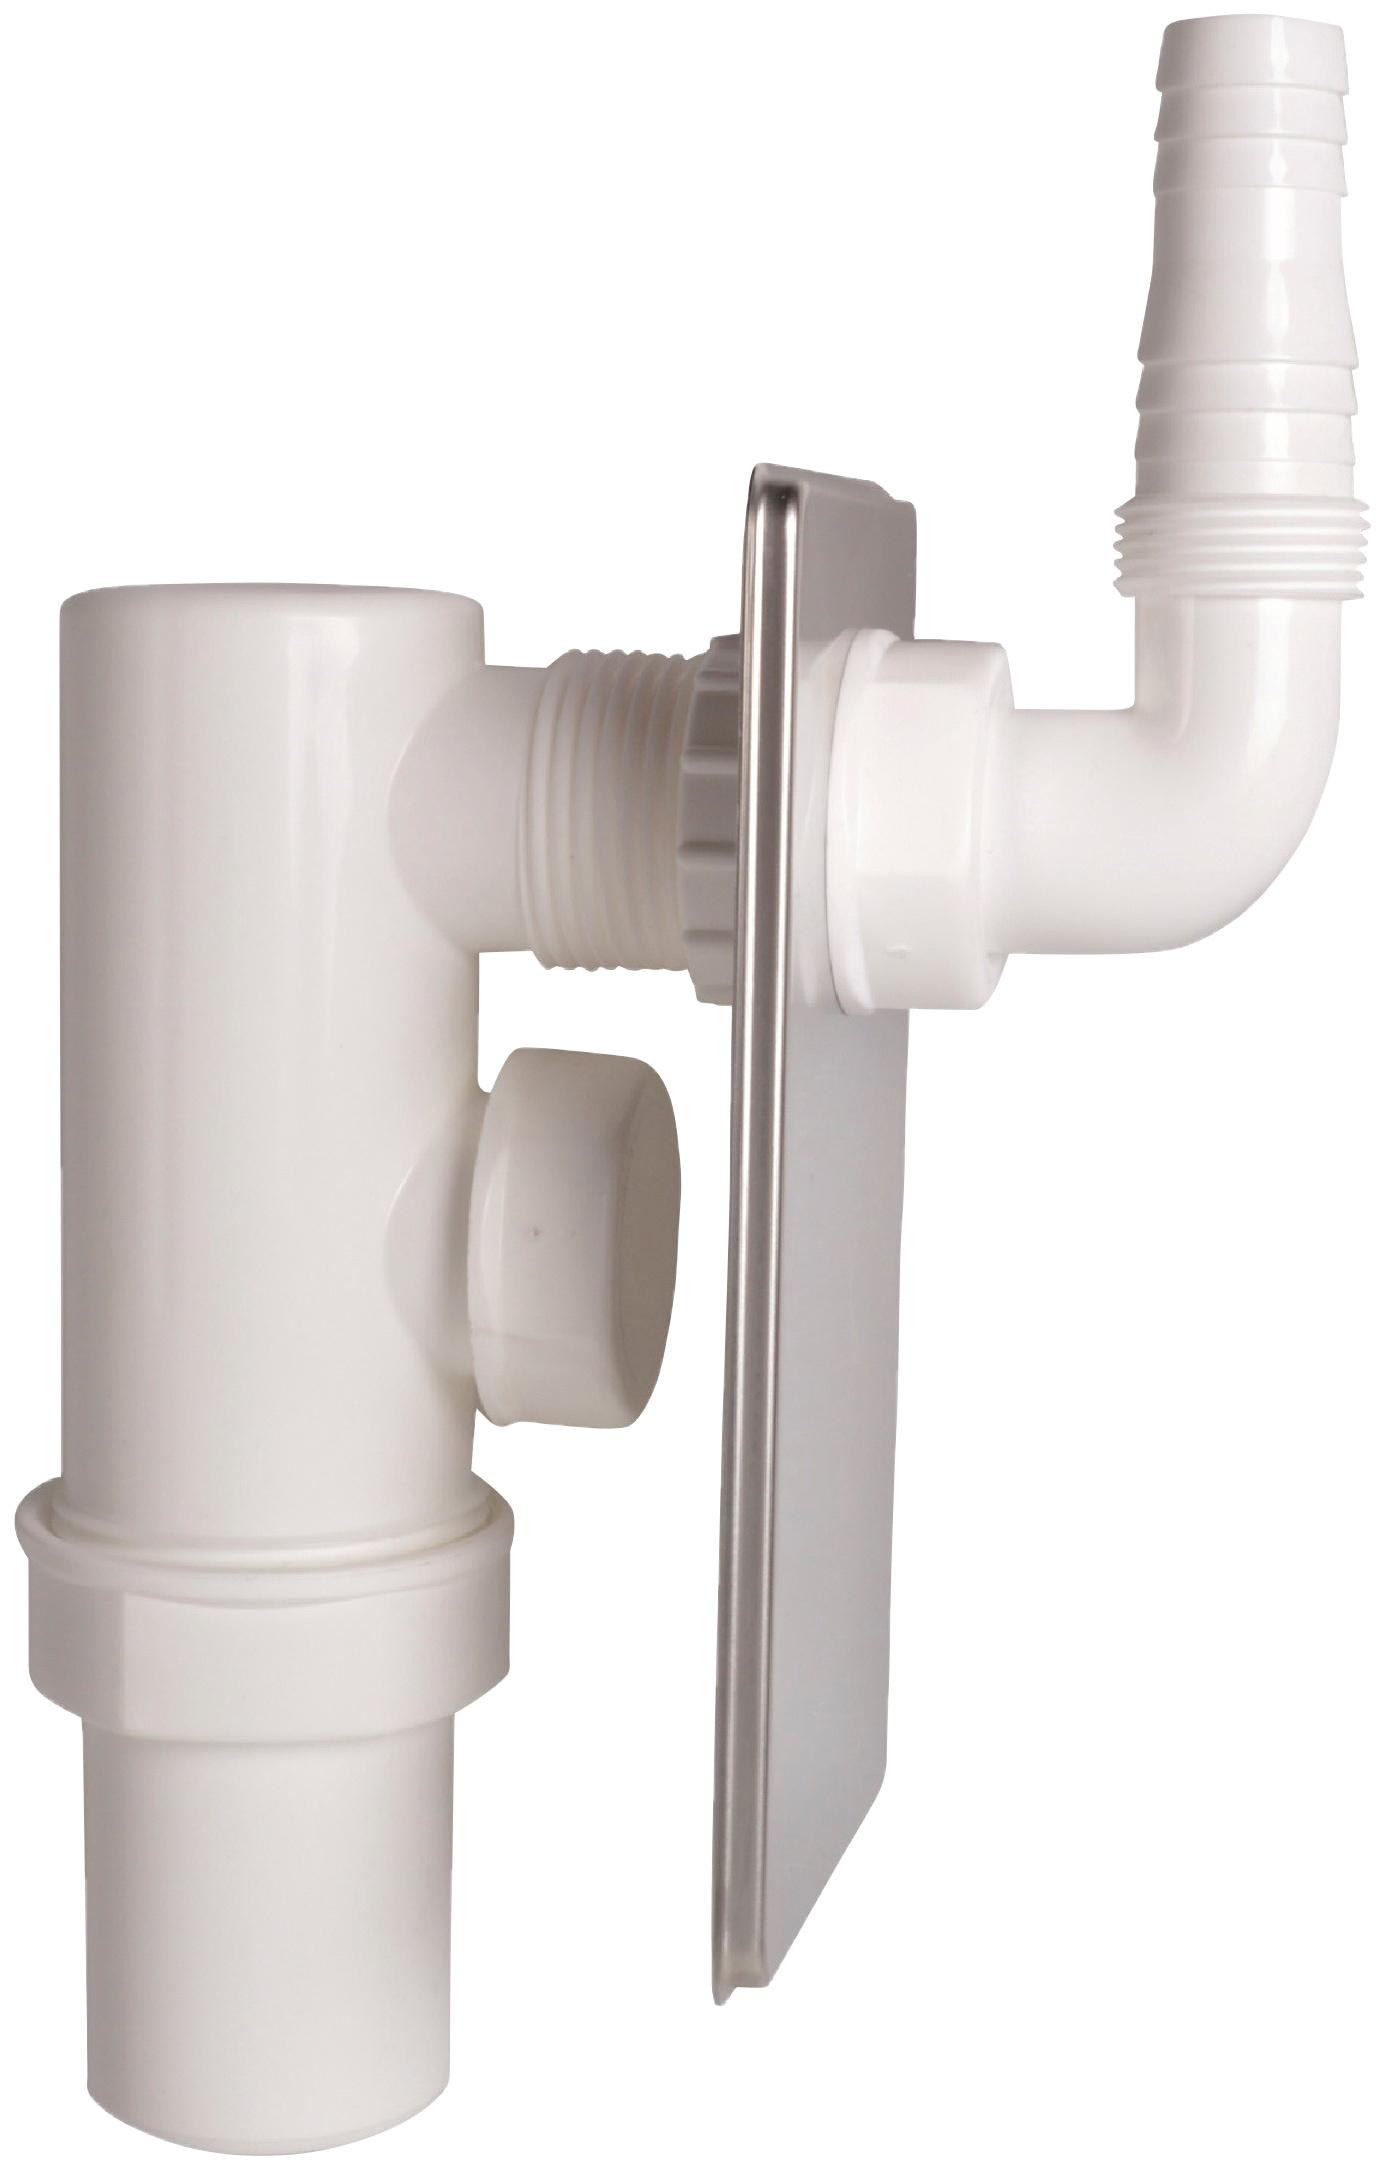 KIRCHHOFF Siphon Unterputz, für Waschmaschinen | Bad > Waschmaschinen und Trockner > Waschmaschinen Zubehör | Edelstahl | KIRCHHOFF